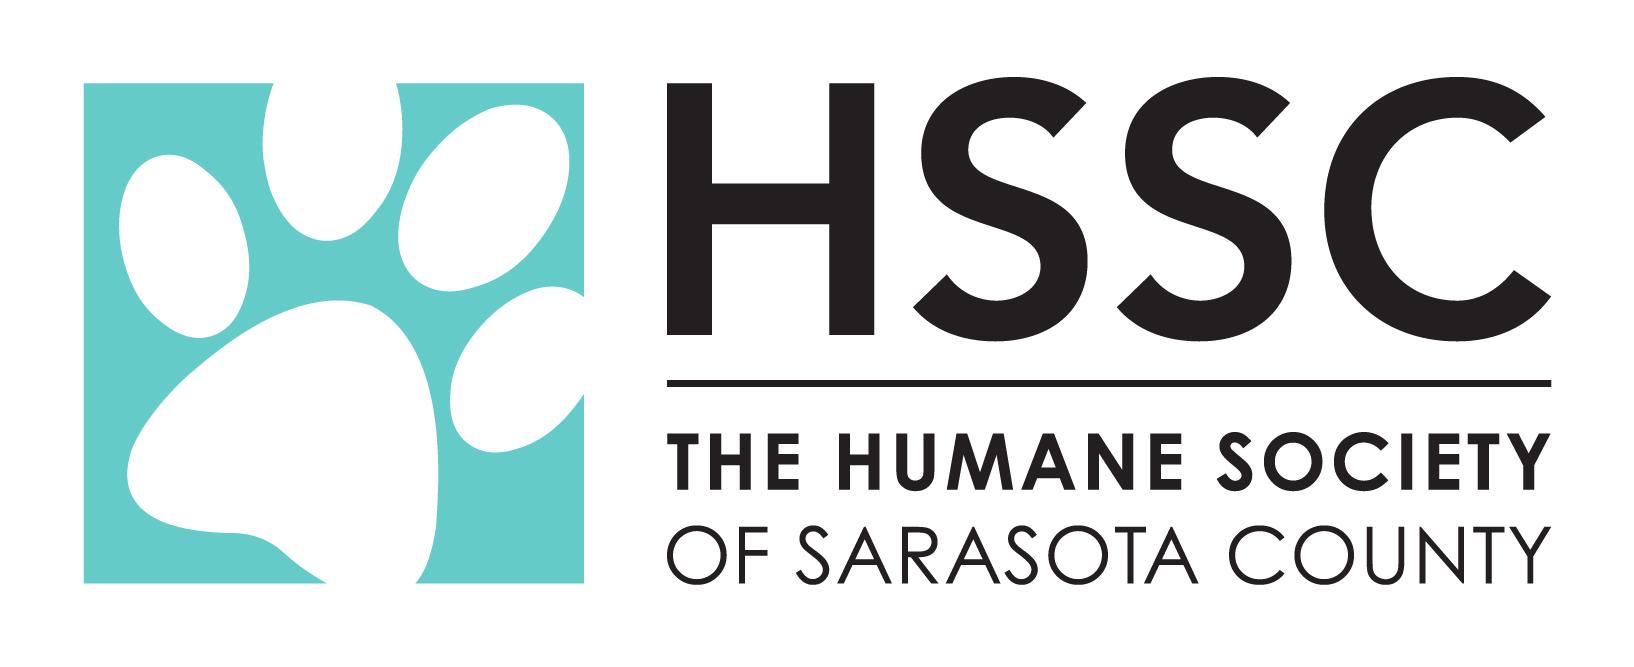 HSSC-logo-teal-box-white-paw-black-text-RGB-0517